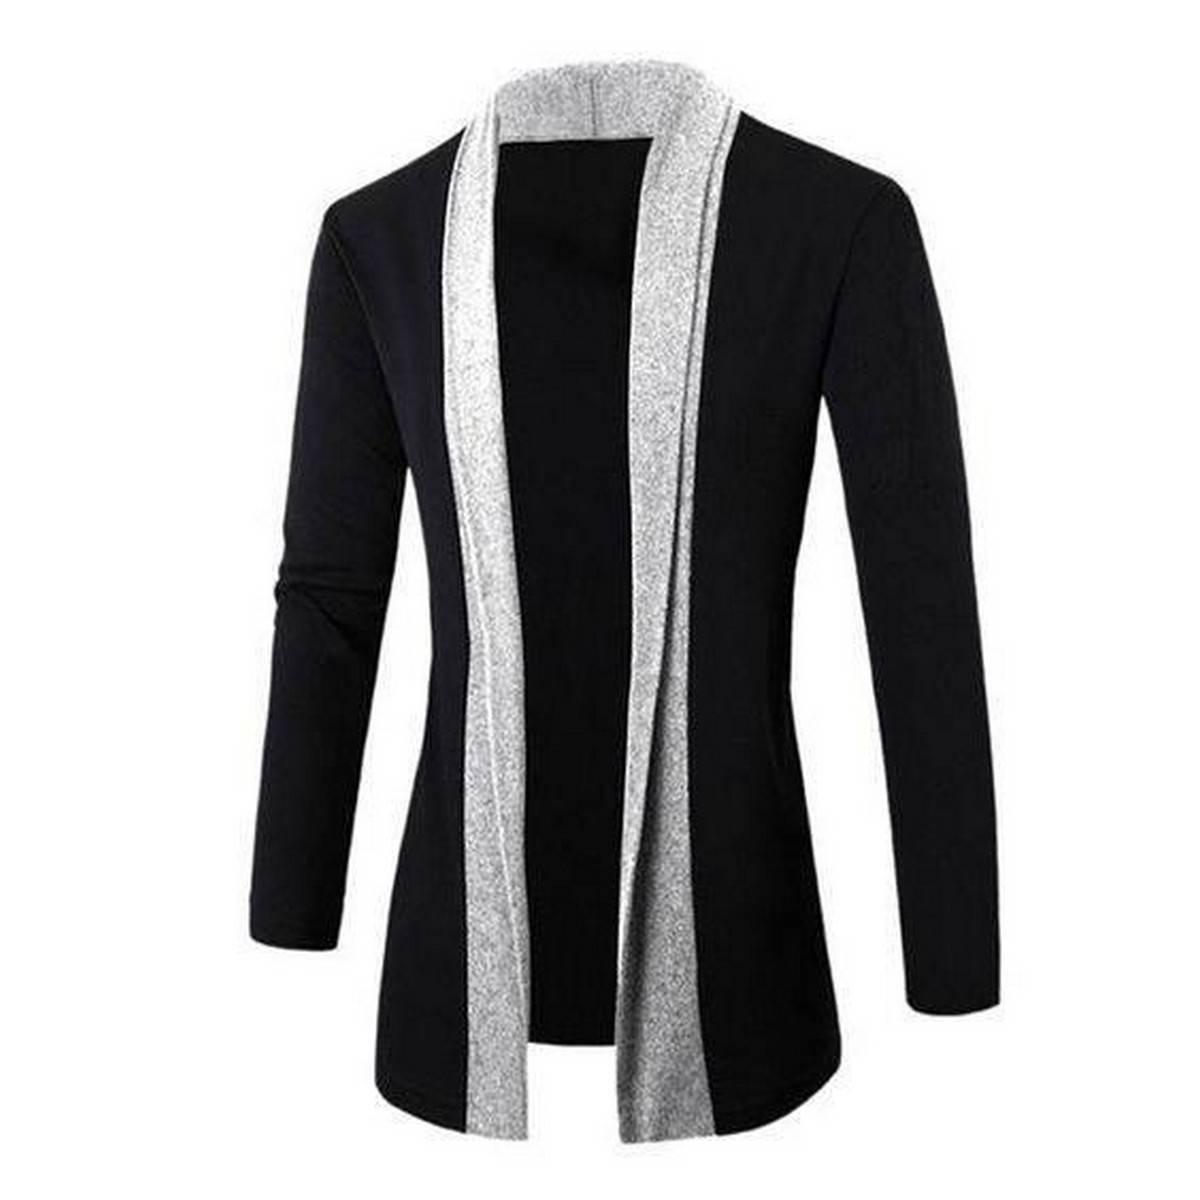 Oxygen Clothing Black Cardigan Hgrey Patch